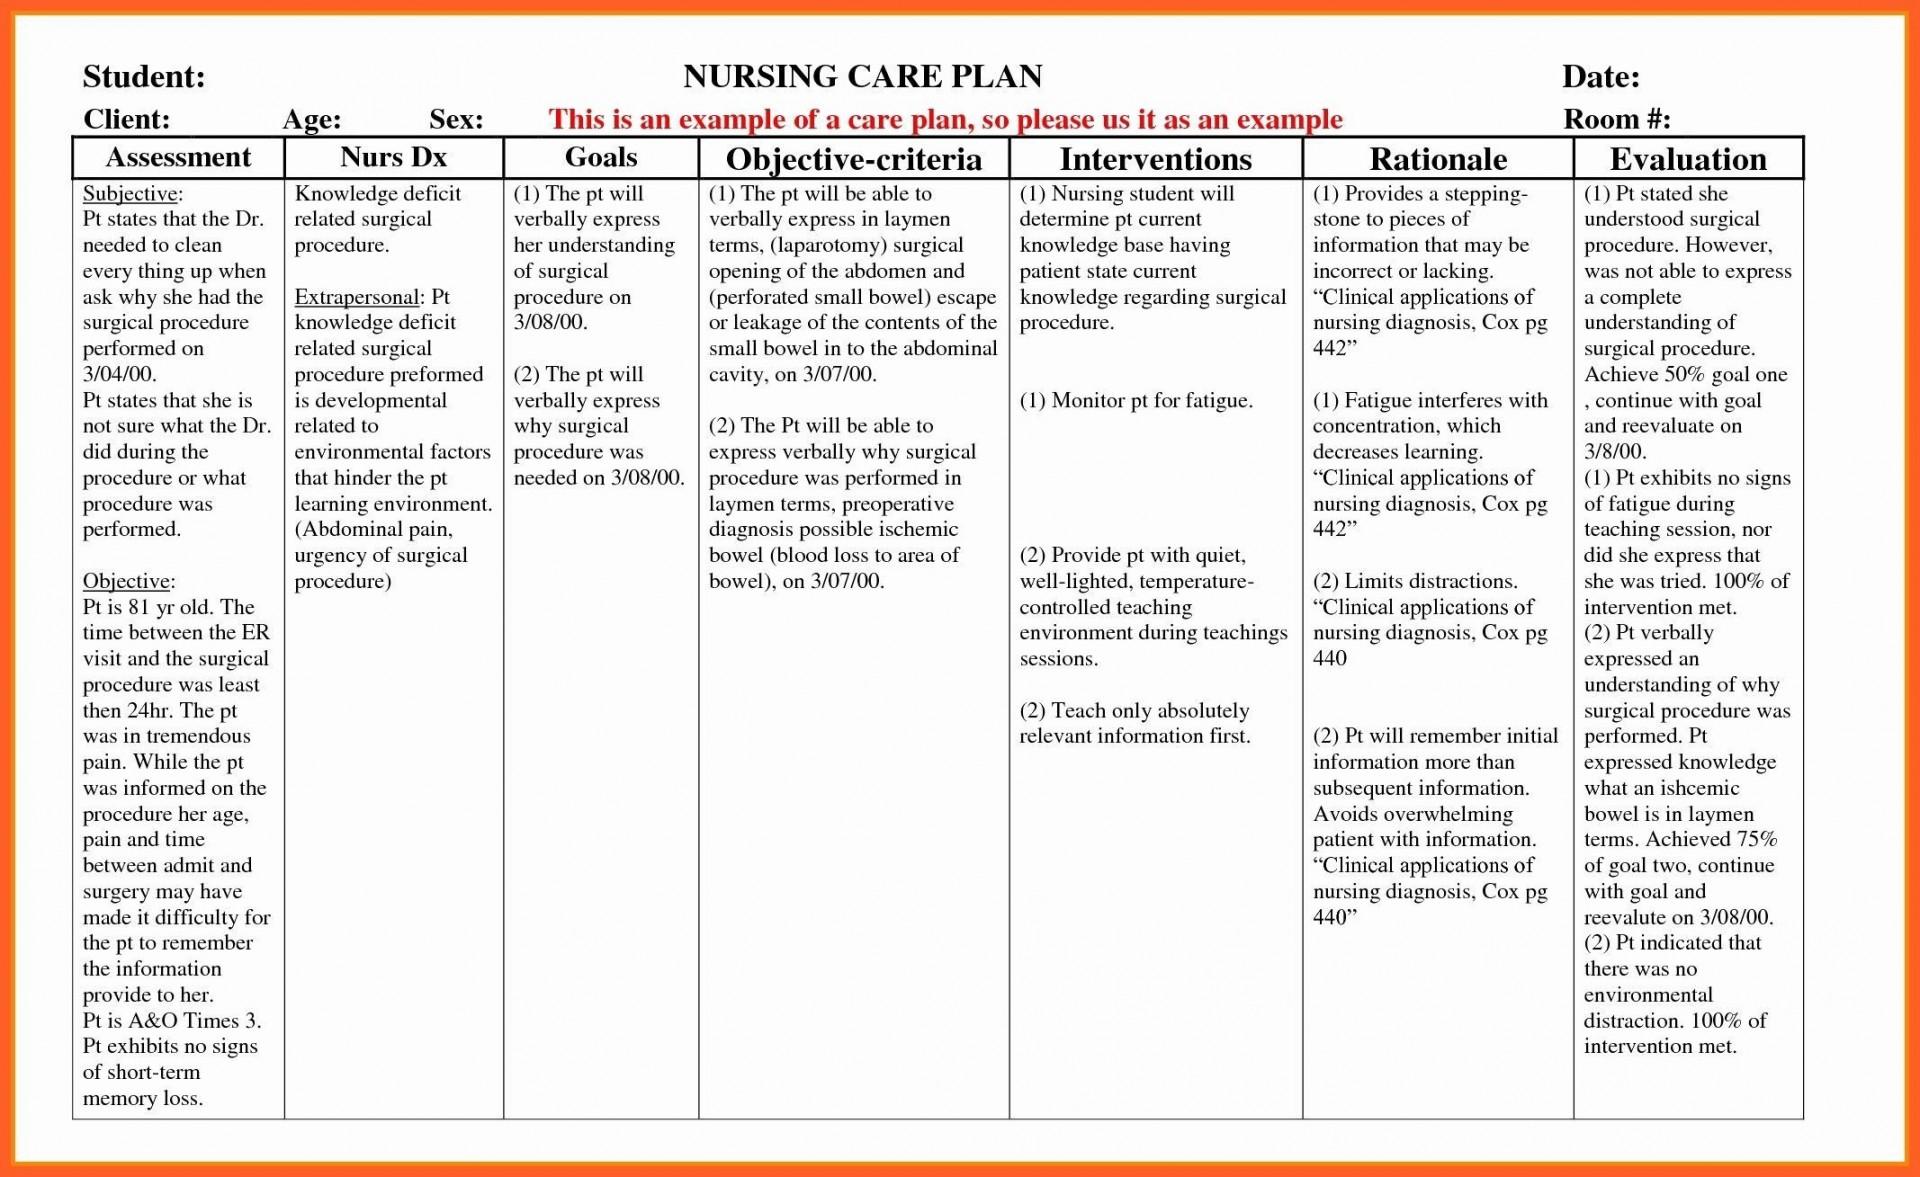 001 Fascinating Nursing Care Plan Template High Def  Example Australia Home For Diabete1920